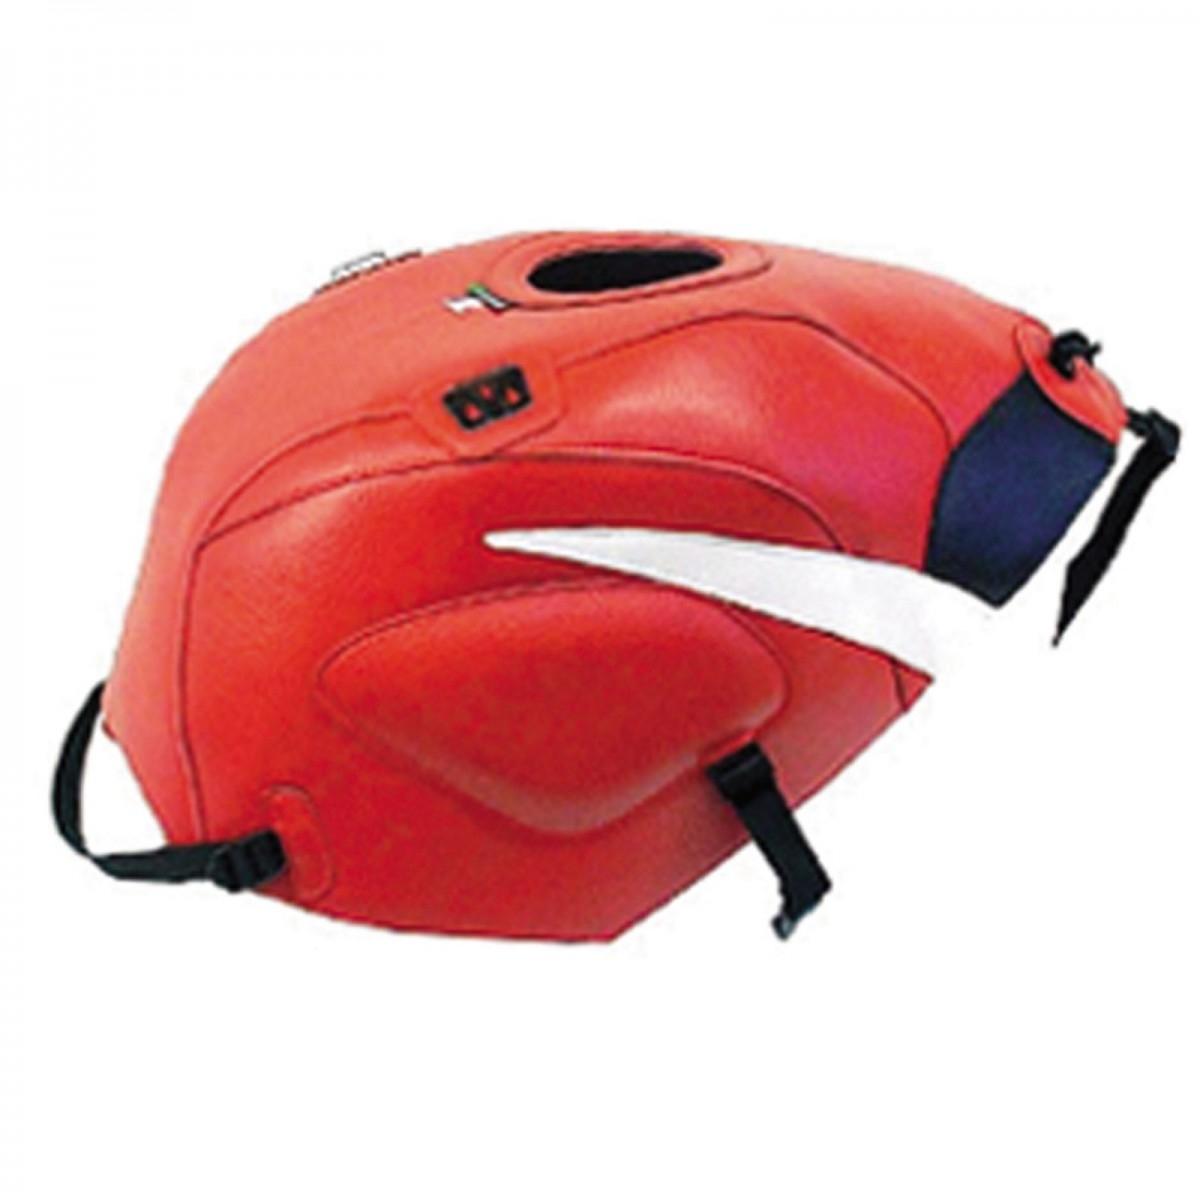 Protège-réservoir Bagster Honda CBR 600 F / SPORT / CBR 600 S2 01-05 r